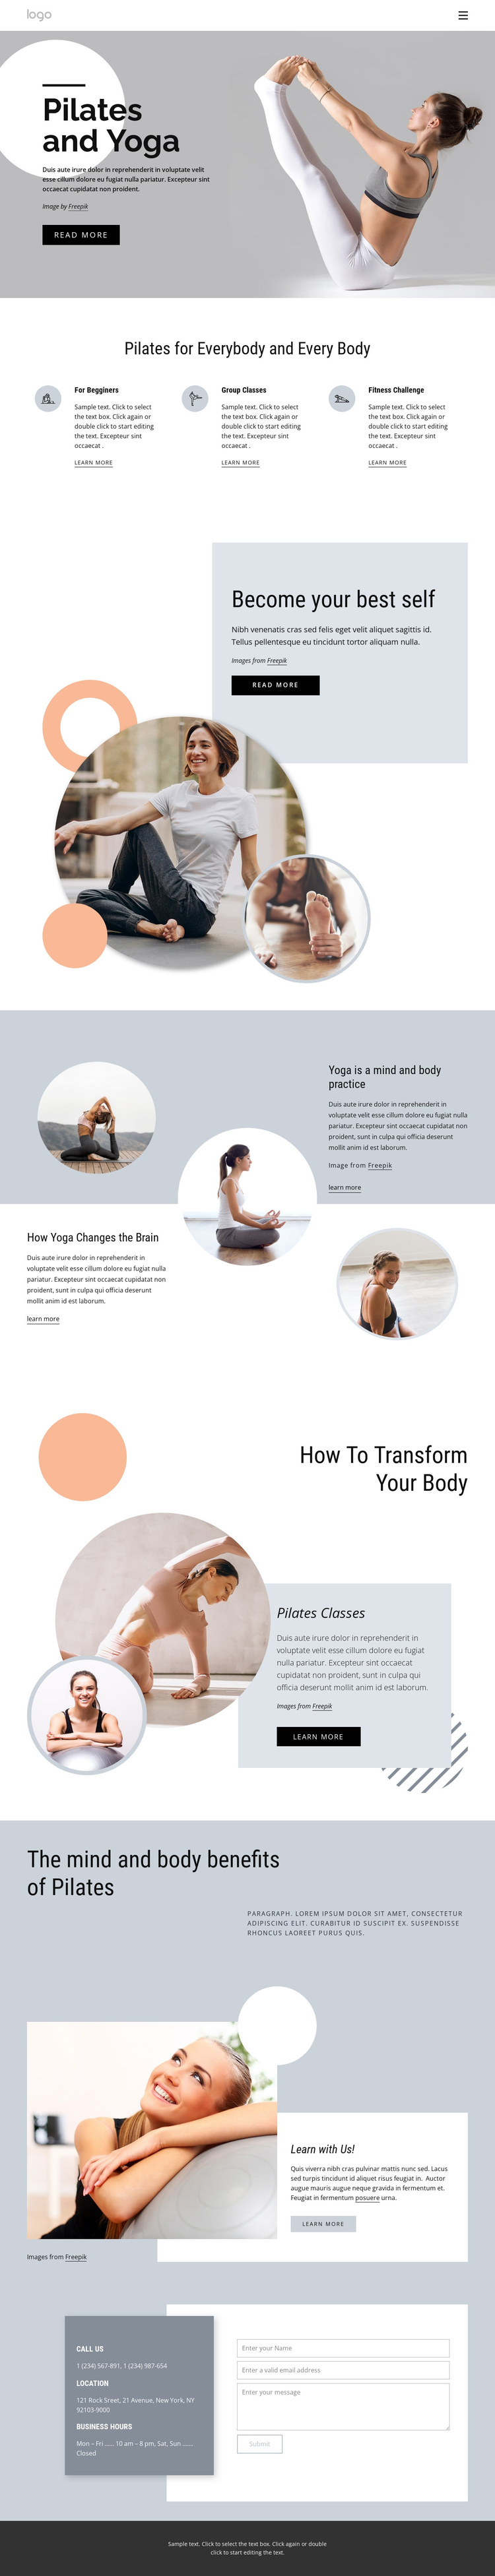 Pilates and yoga center Joomla Template